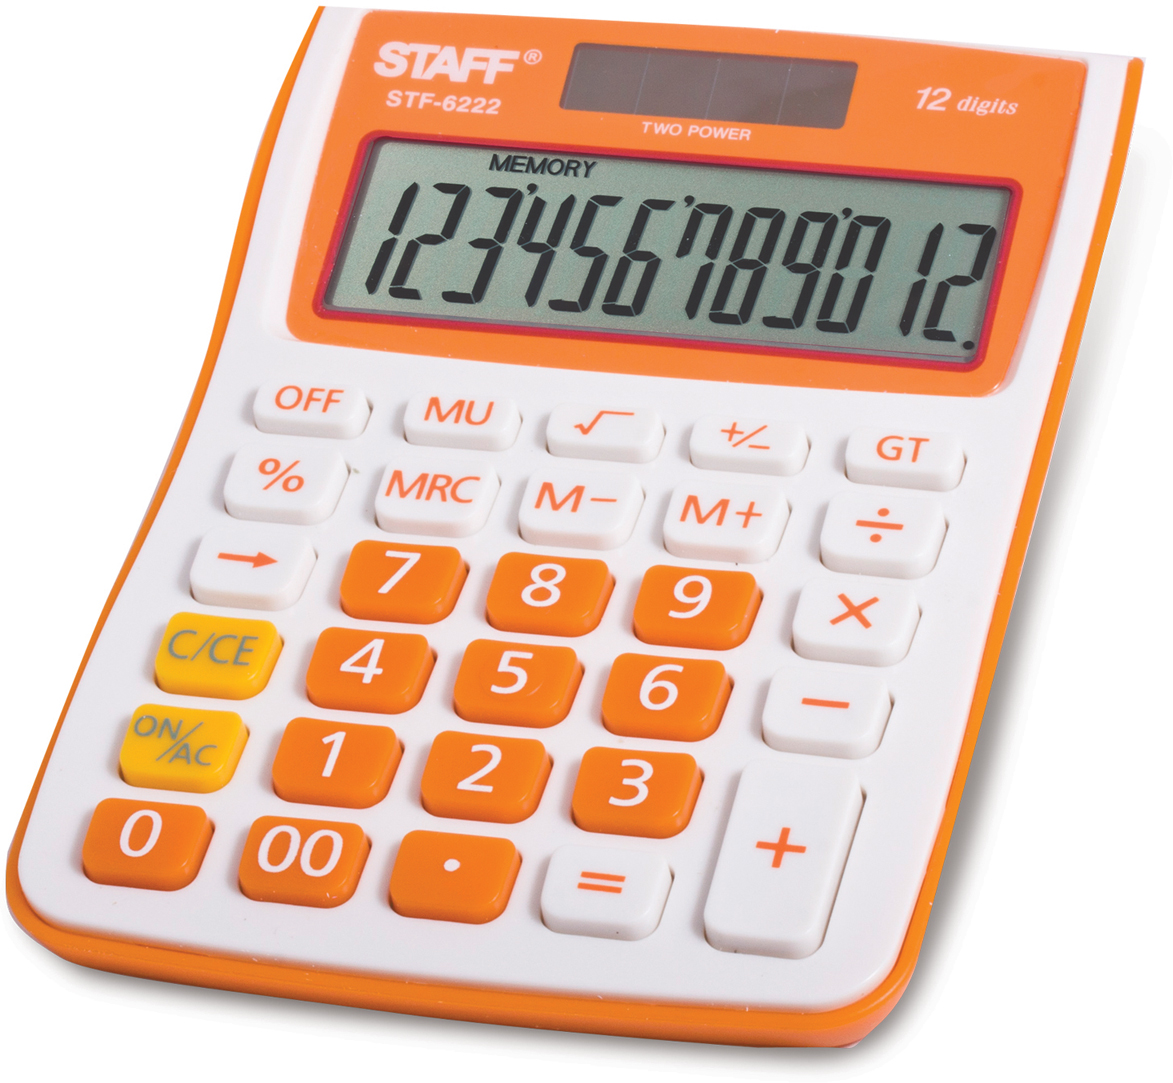 Калькулятор настольный Staff STF-6222, цвет: оранжевый канцелярия staff калькулятор настольный stf 555 white